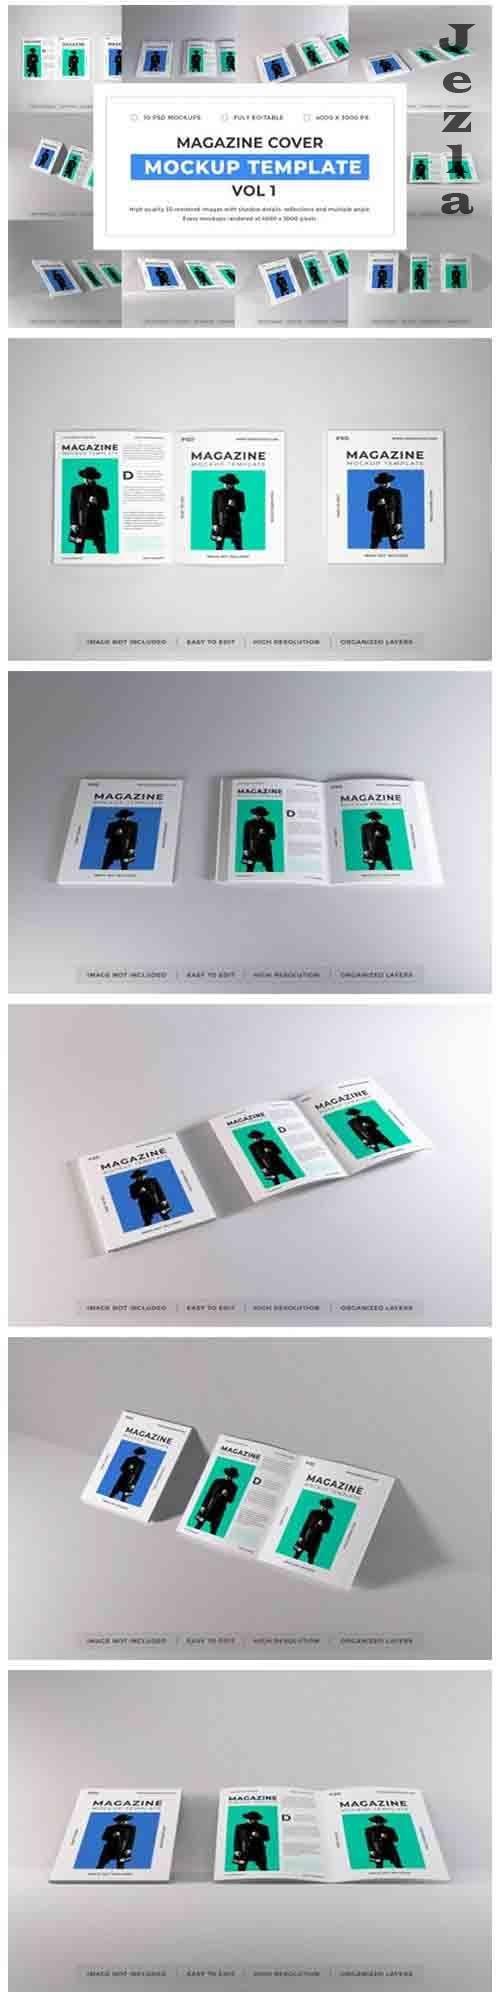 Magazine Cover Mockup Template Bundle Vol 1 - 1053889